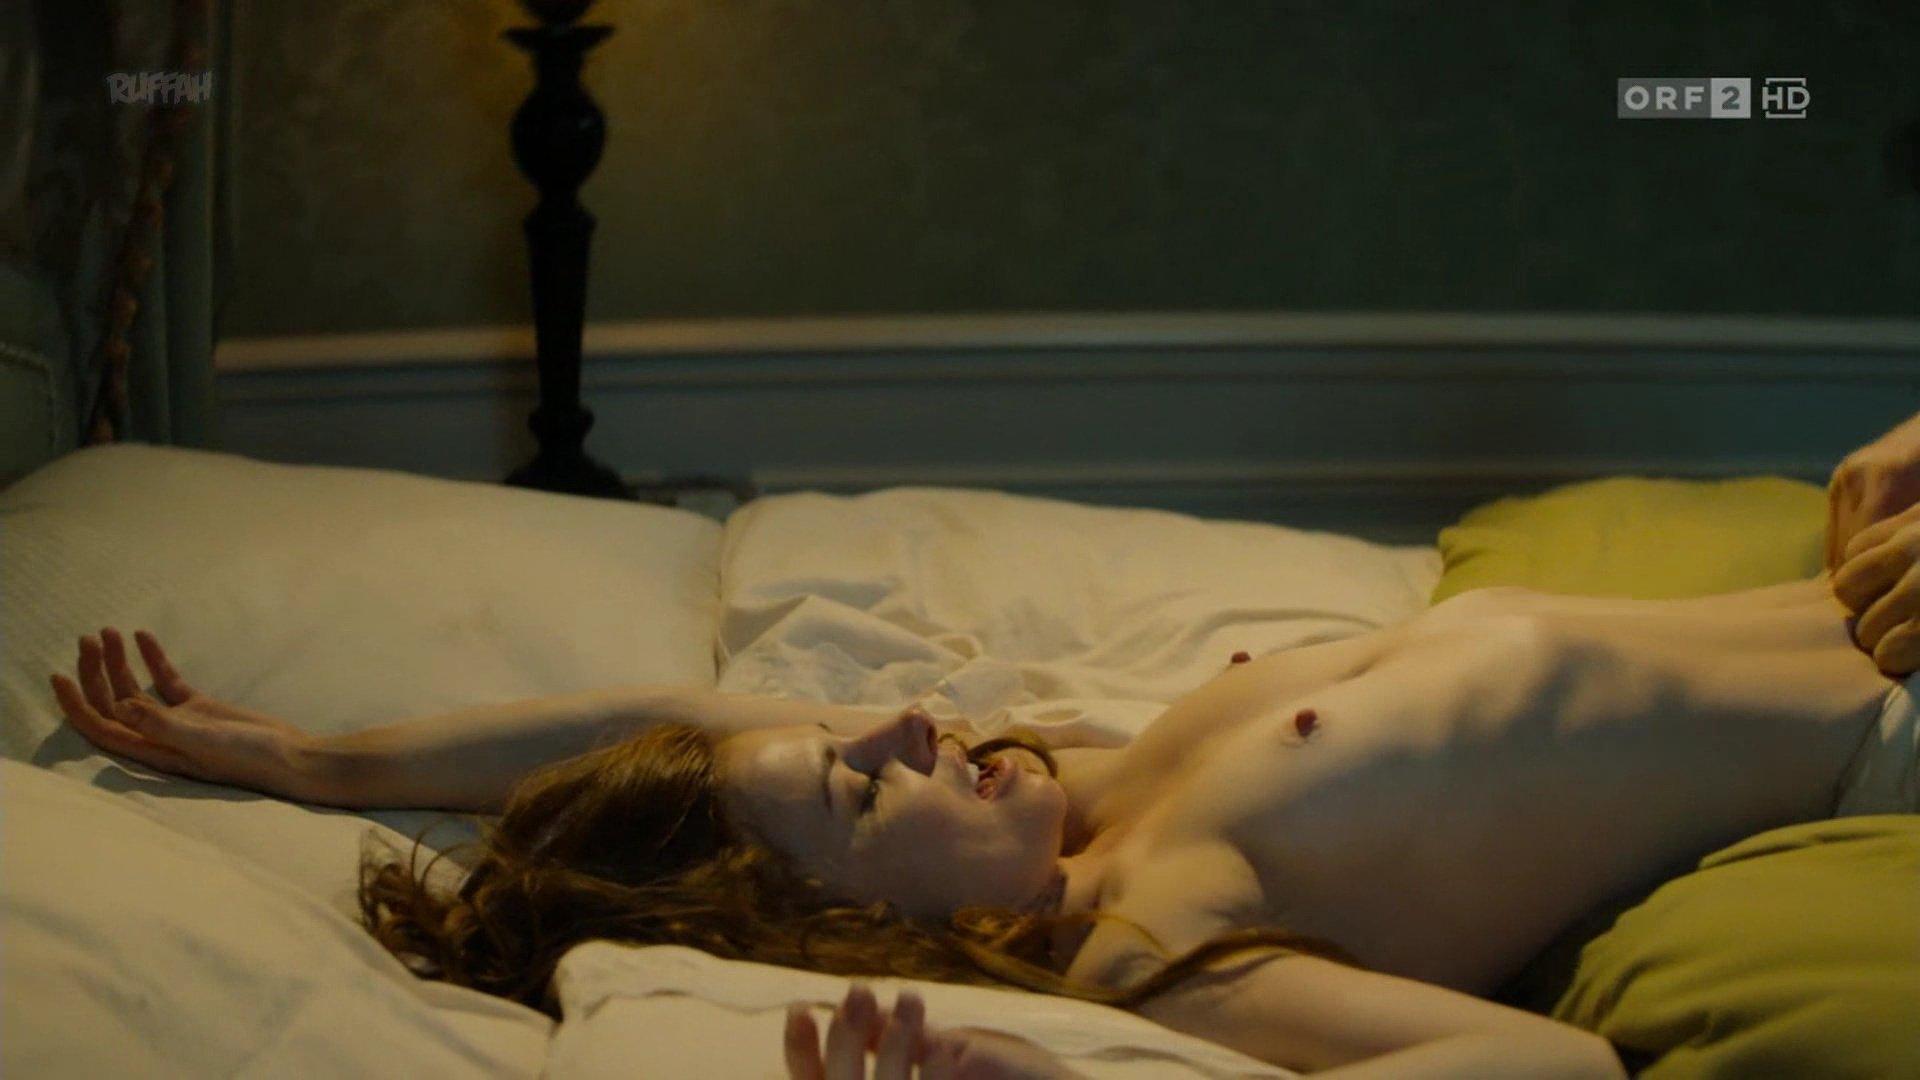 Josefine Preub nude - Das Sacher In Bester Gesellschaft s01e02 (2017)